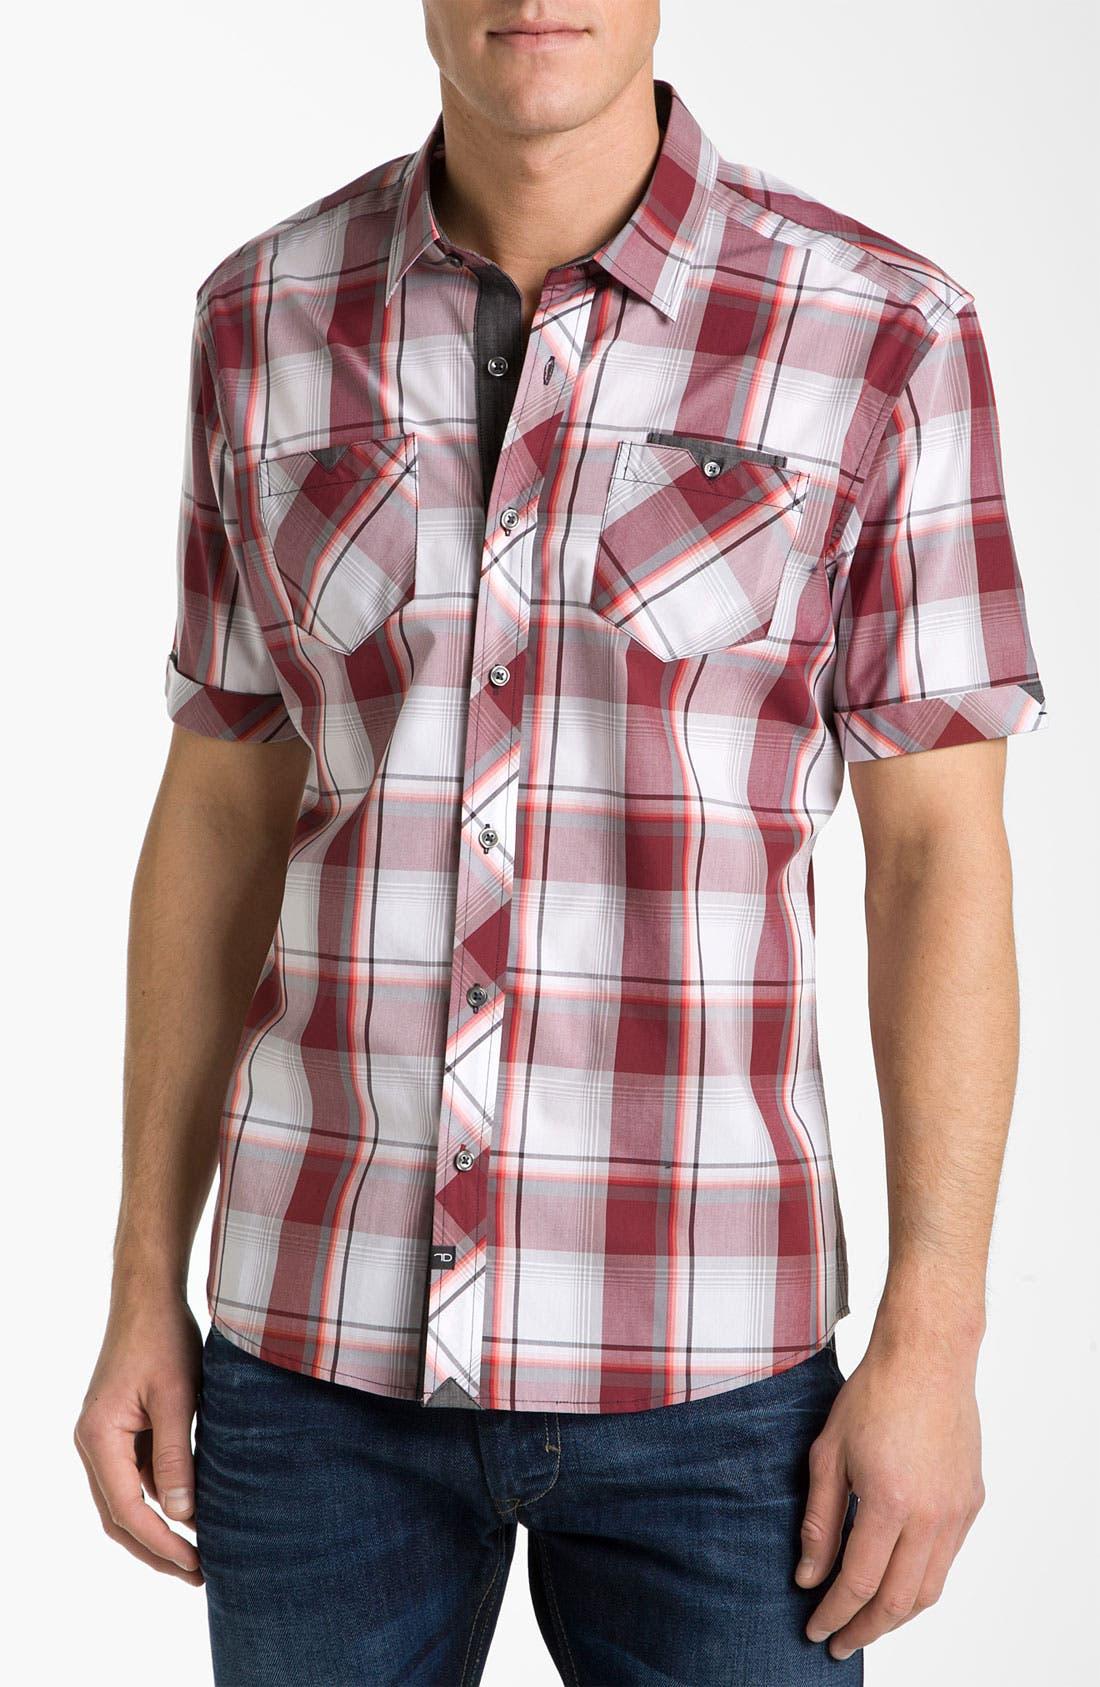 Main Image - 7 Diamonds 'Up Above the Rock' Plaid Woven Short Sleeve Shirt